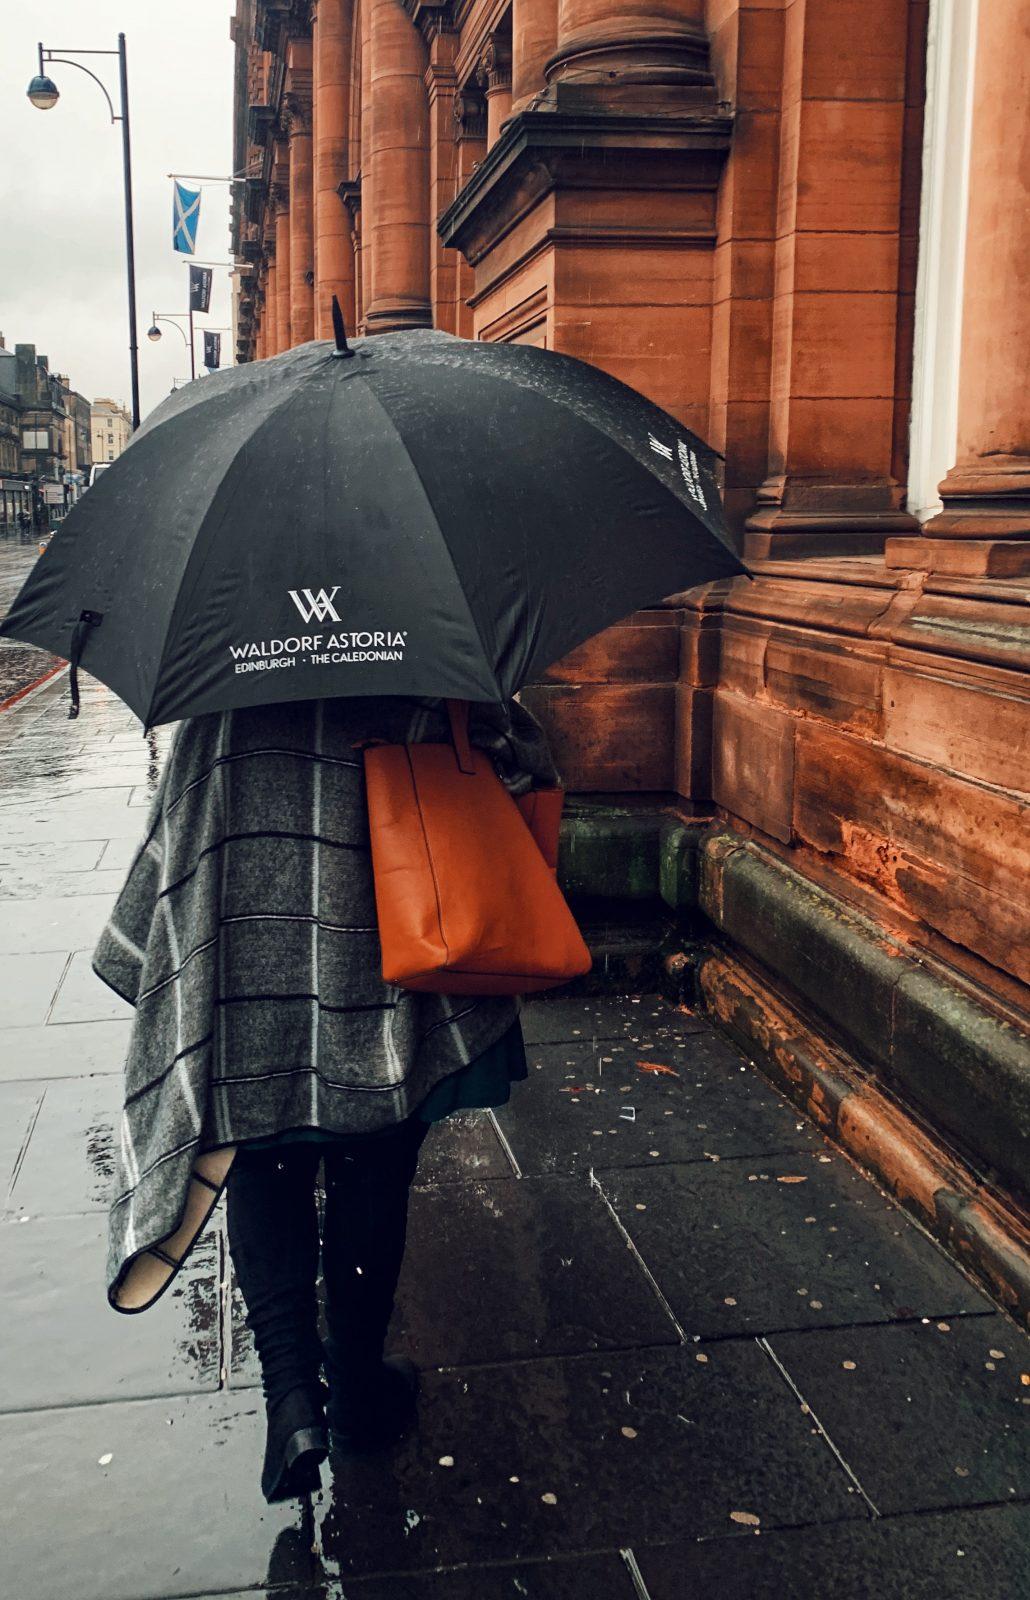 Waldorf Astoria Umbrella